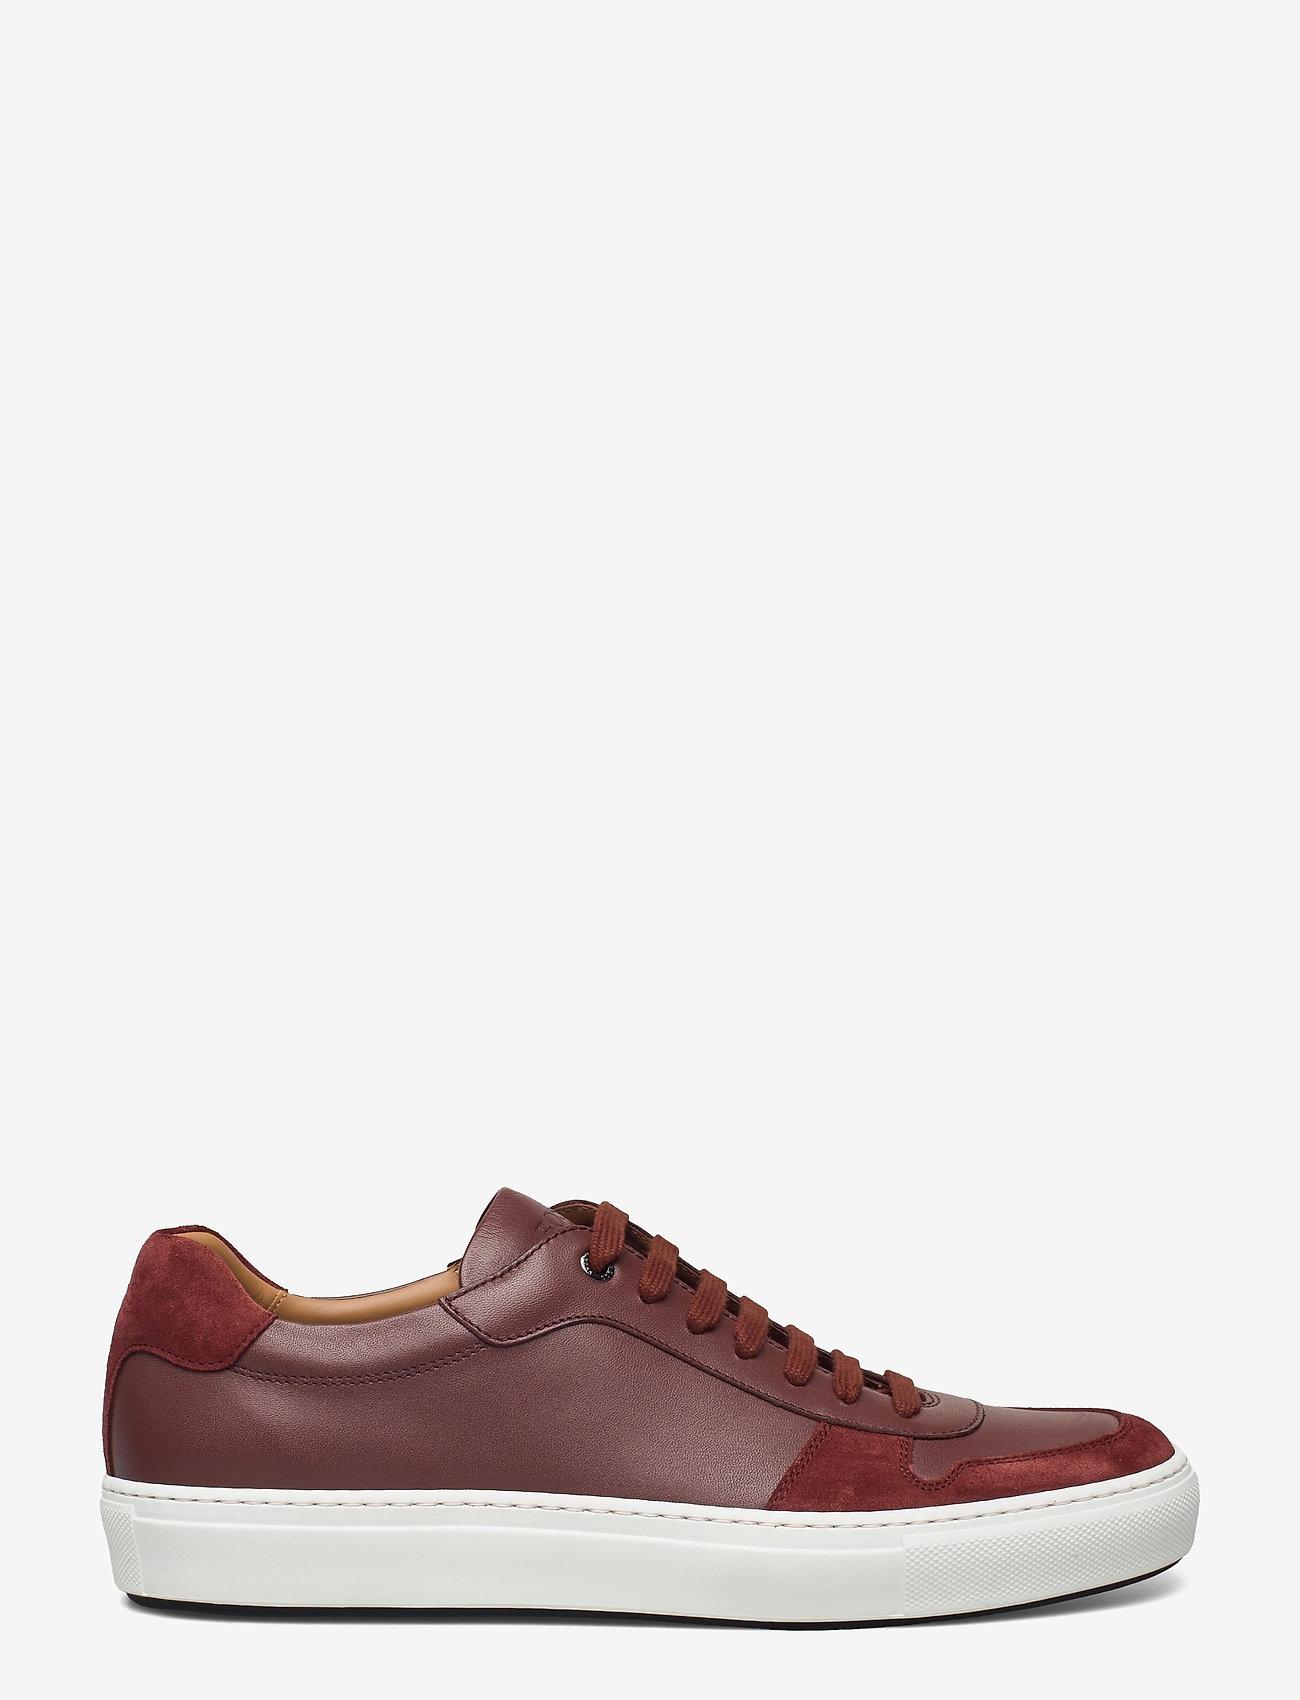 BOSS - Mirage_Tenn_oxns - låga sneakers - rust/copper - 0